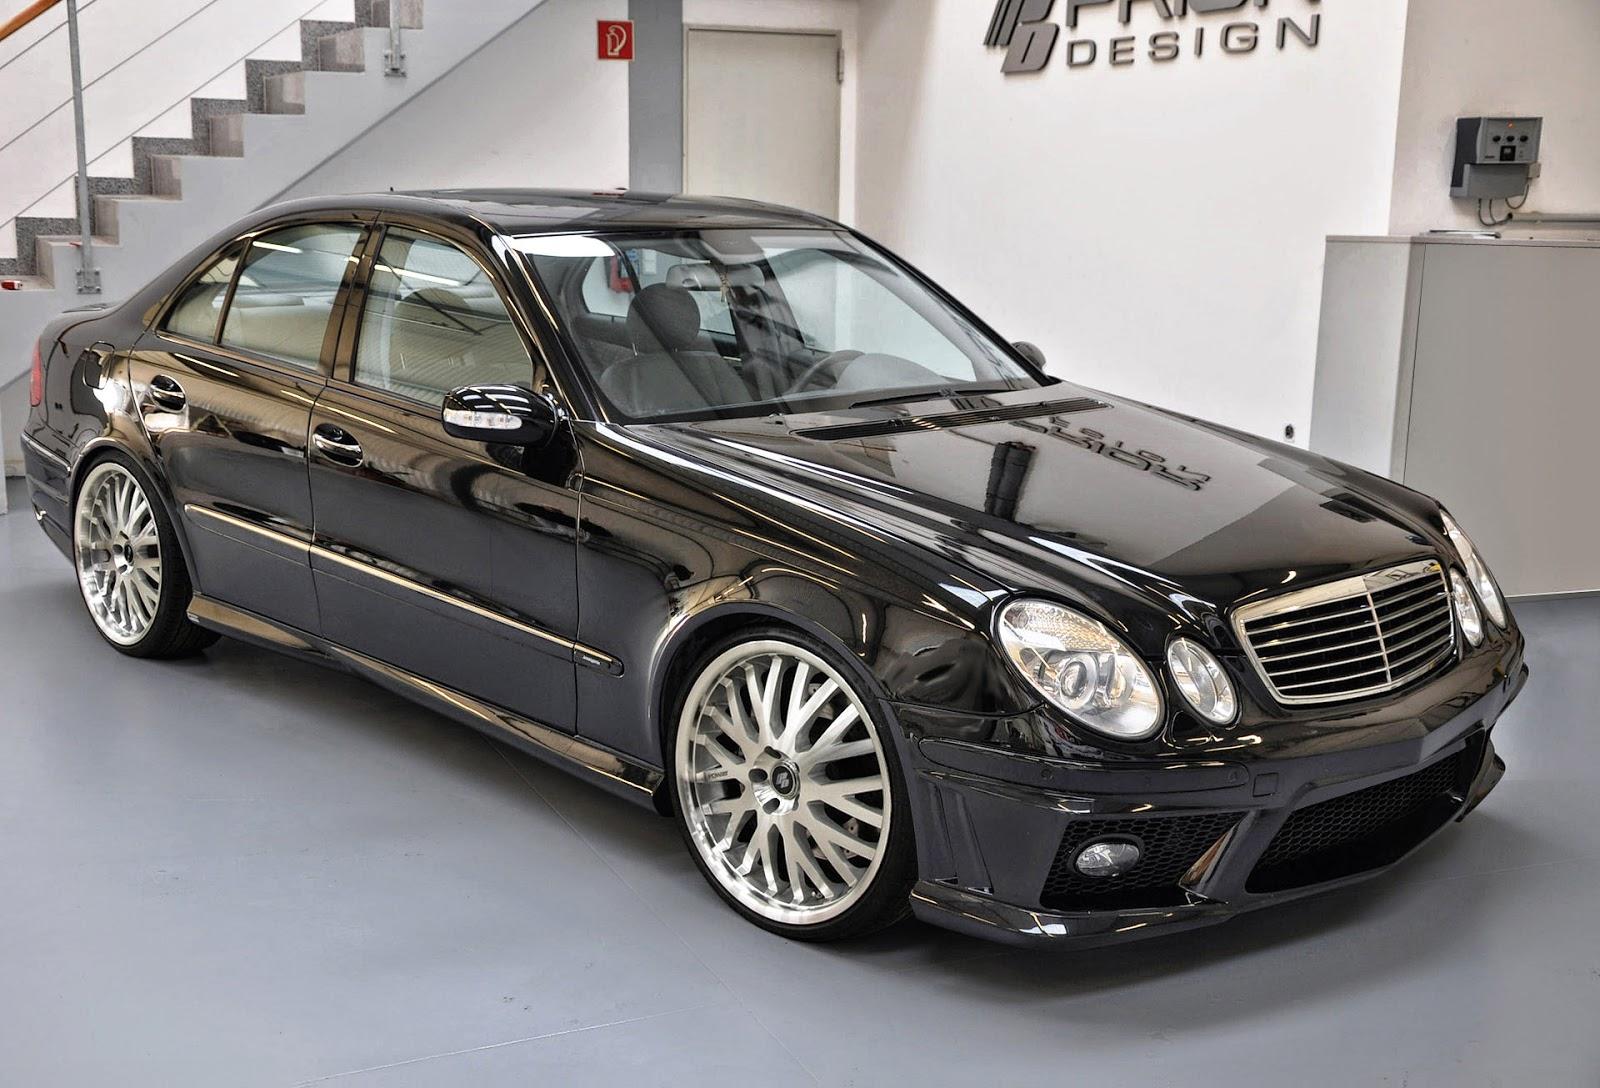 Mercedes benz e klasse w211 prior design body kit benztuning for Mercedes benz body kit